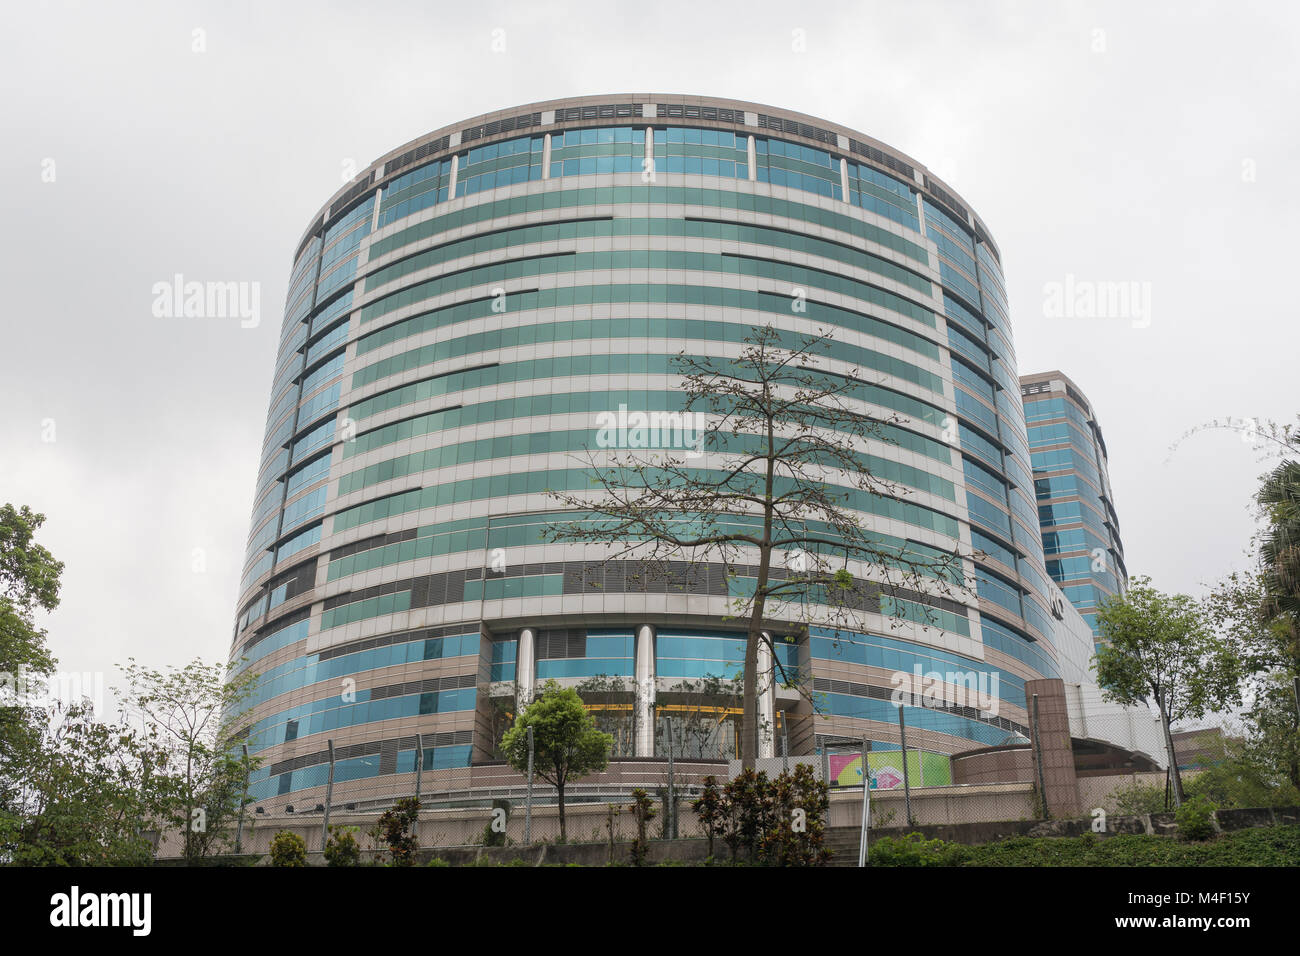 Round Building - Stock Image